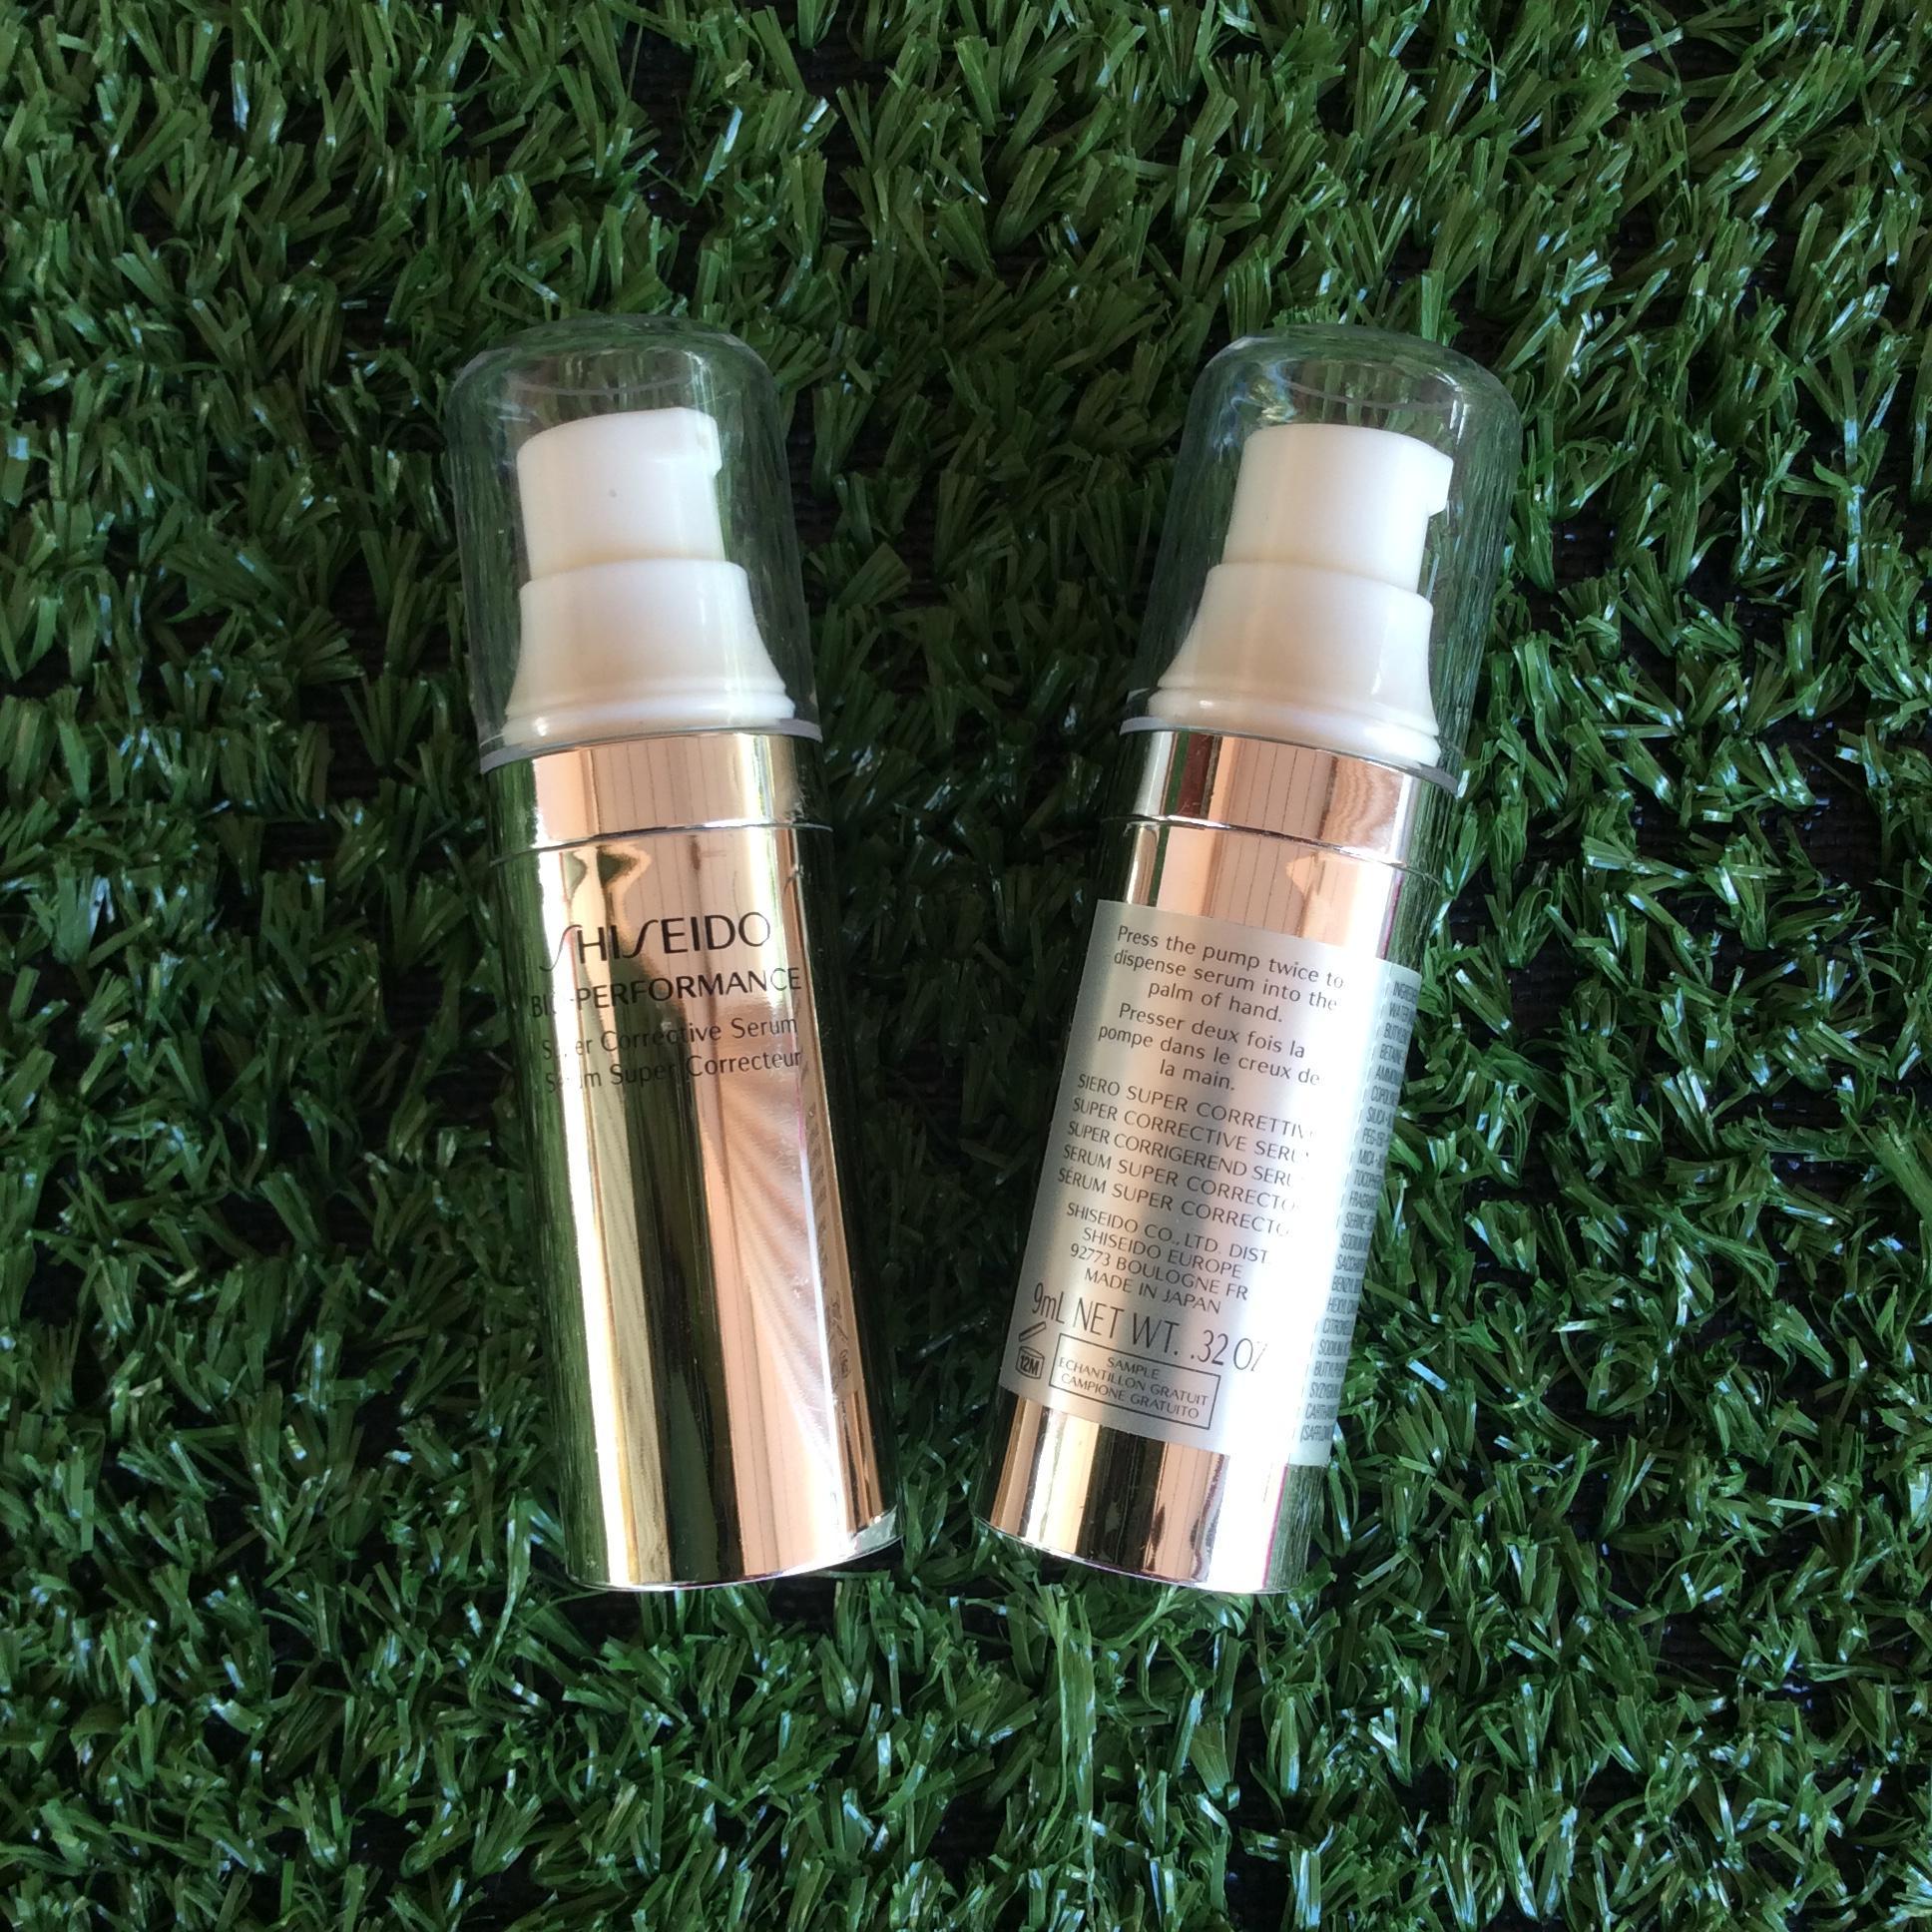 (Tester) Shiseido Bio-Performance Super Corrective Serum 9 mL